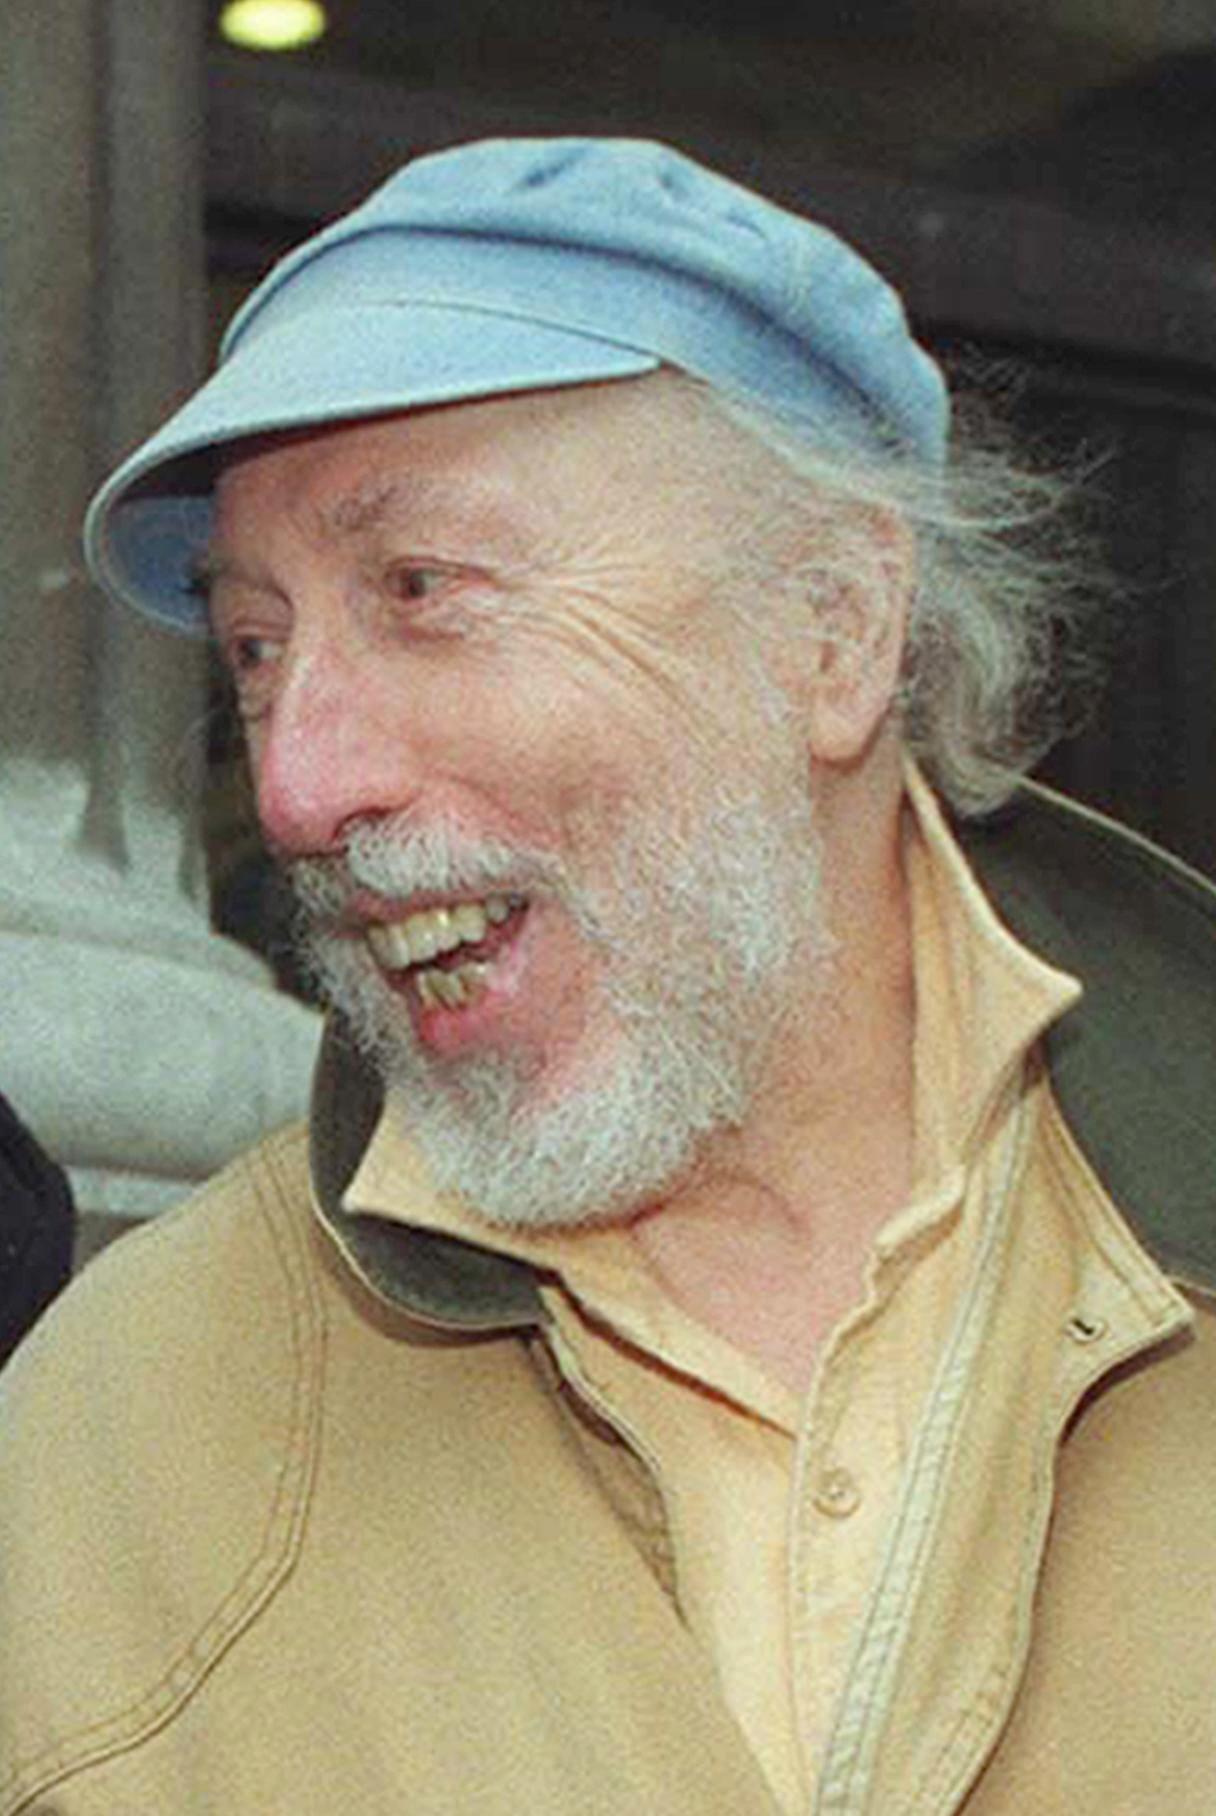 british artist richard hamilton  the  u0026 39 father of pop art